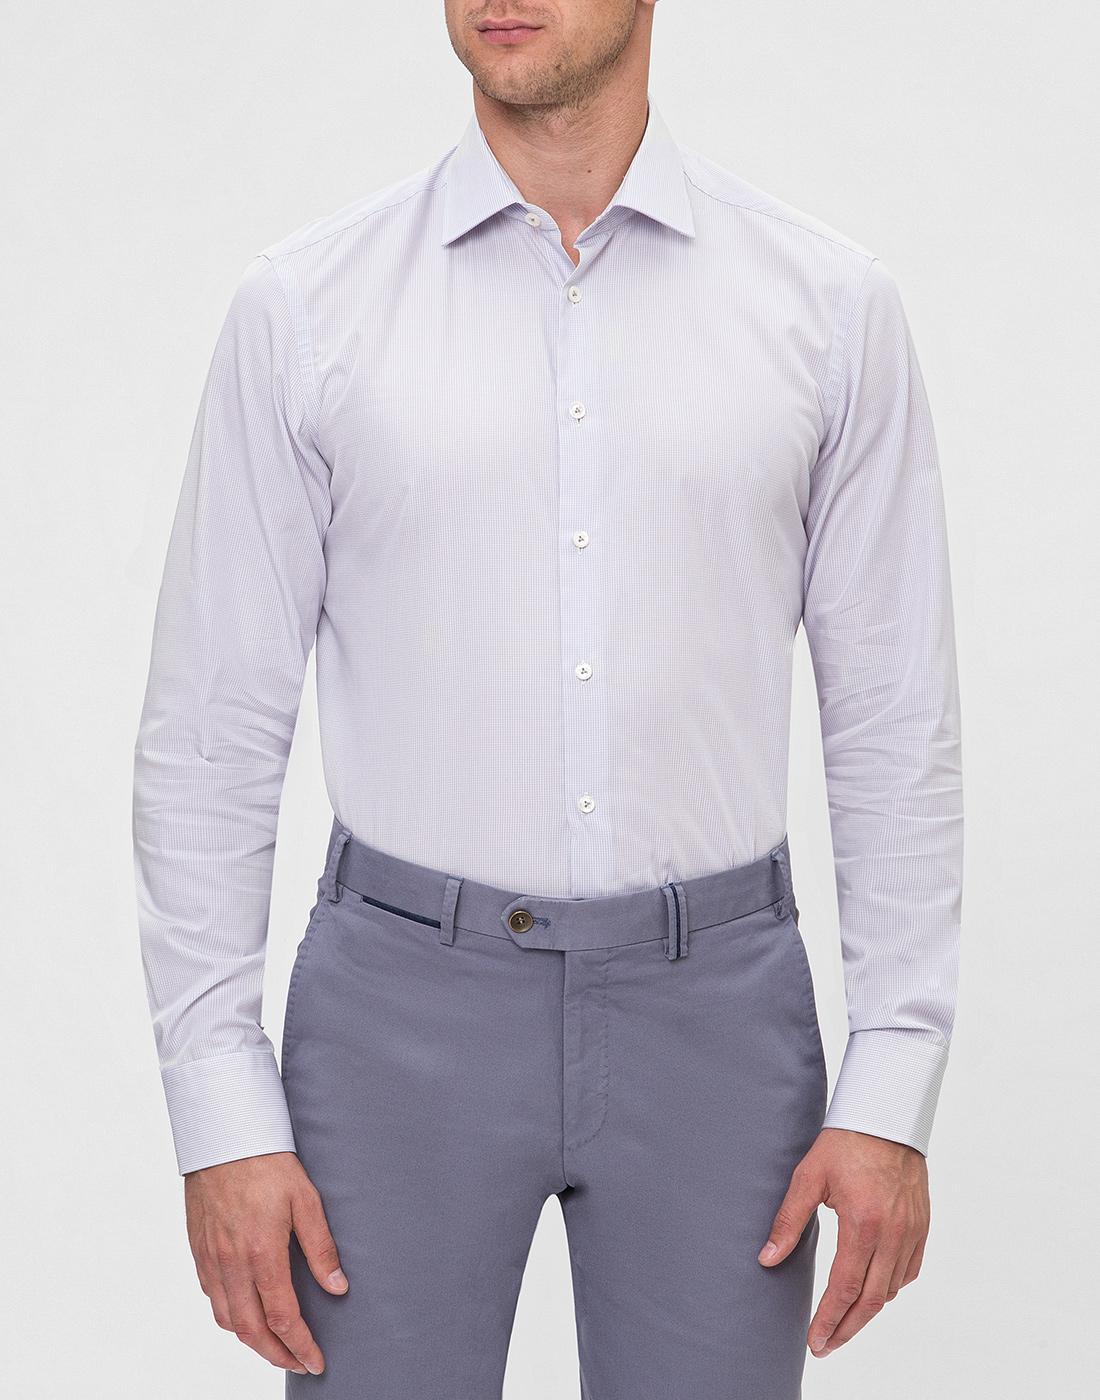 Мужская сиреневая рубашка Van Laack S163209/020-2